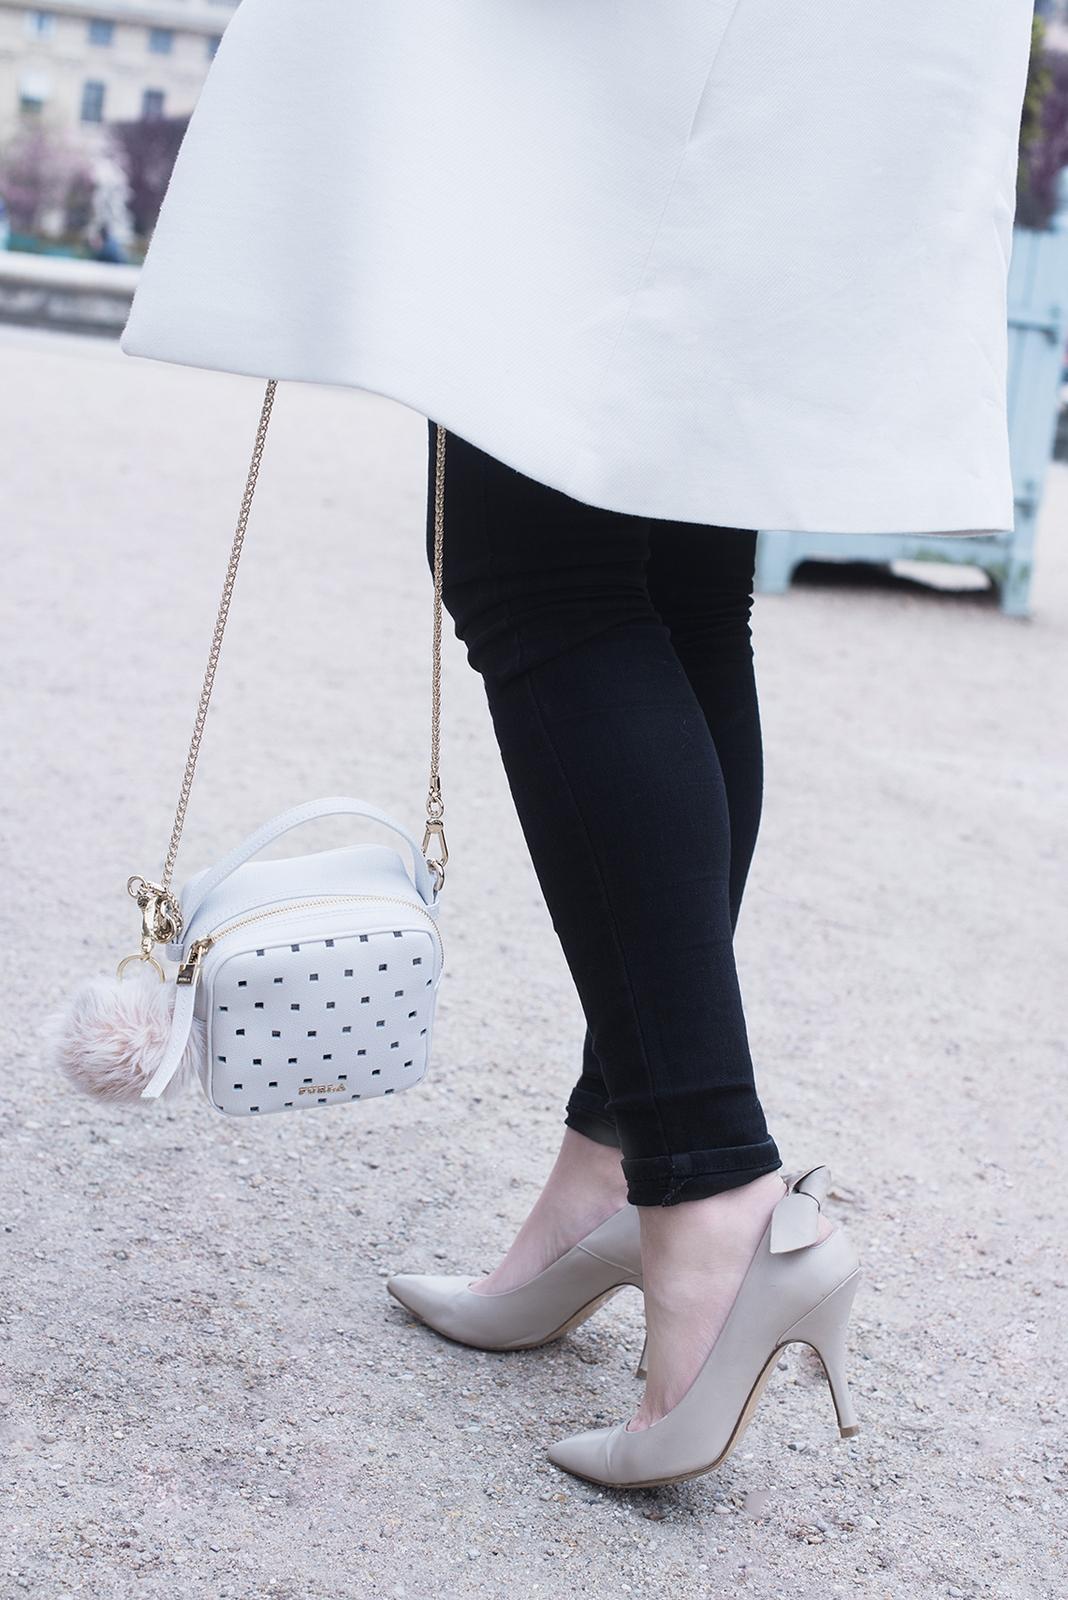 Blog mode femme Paris - Du style, Madame - streetstyle - bag furla white